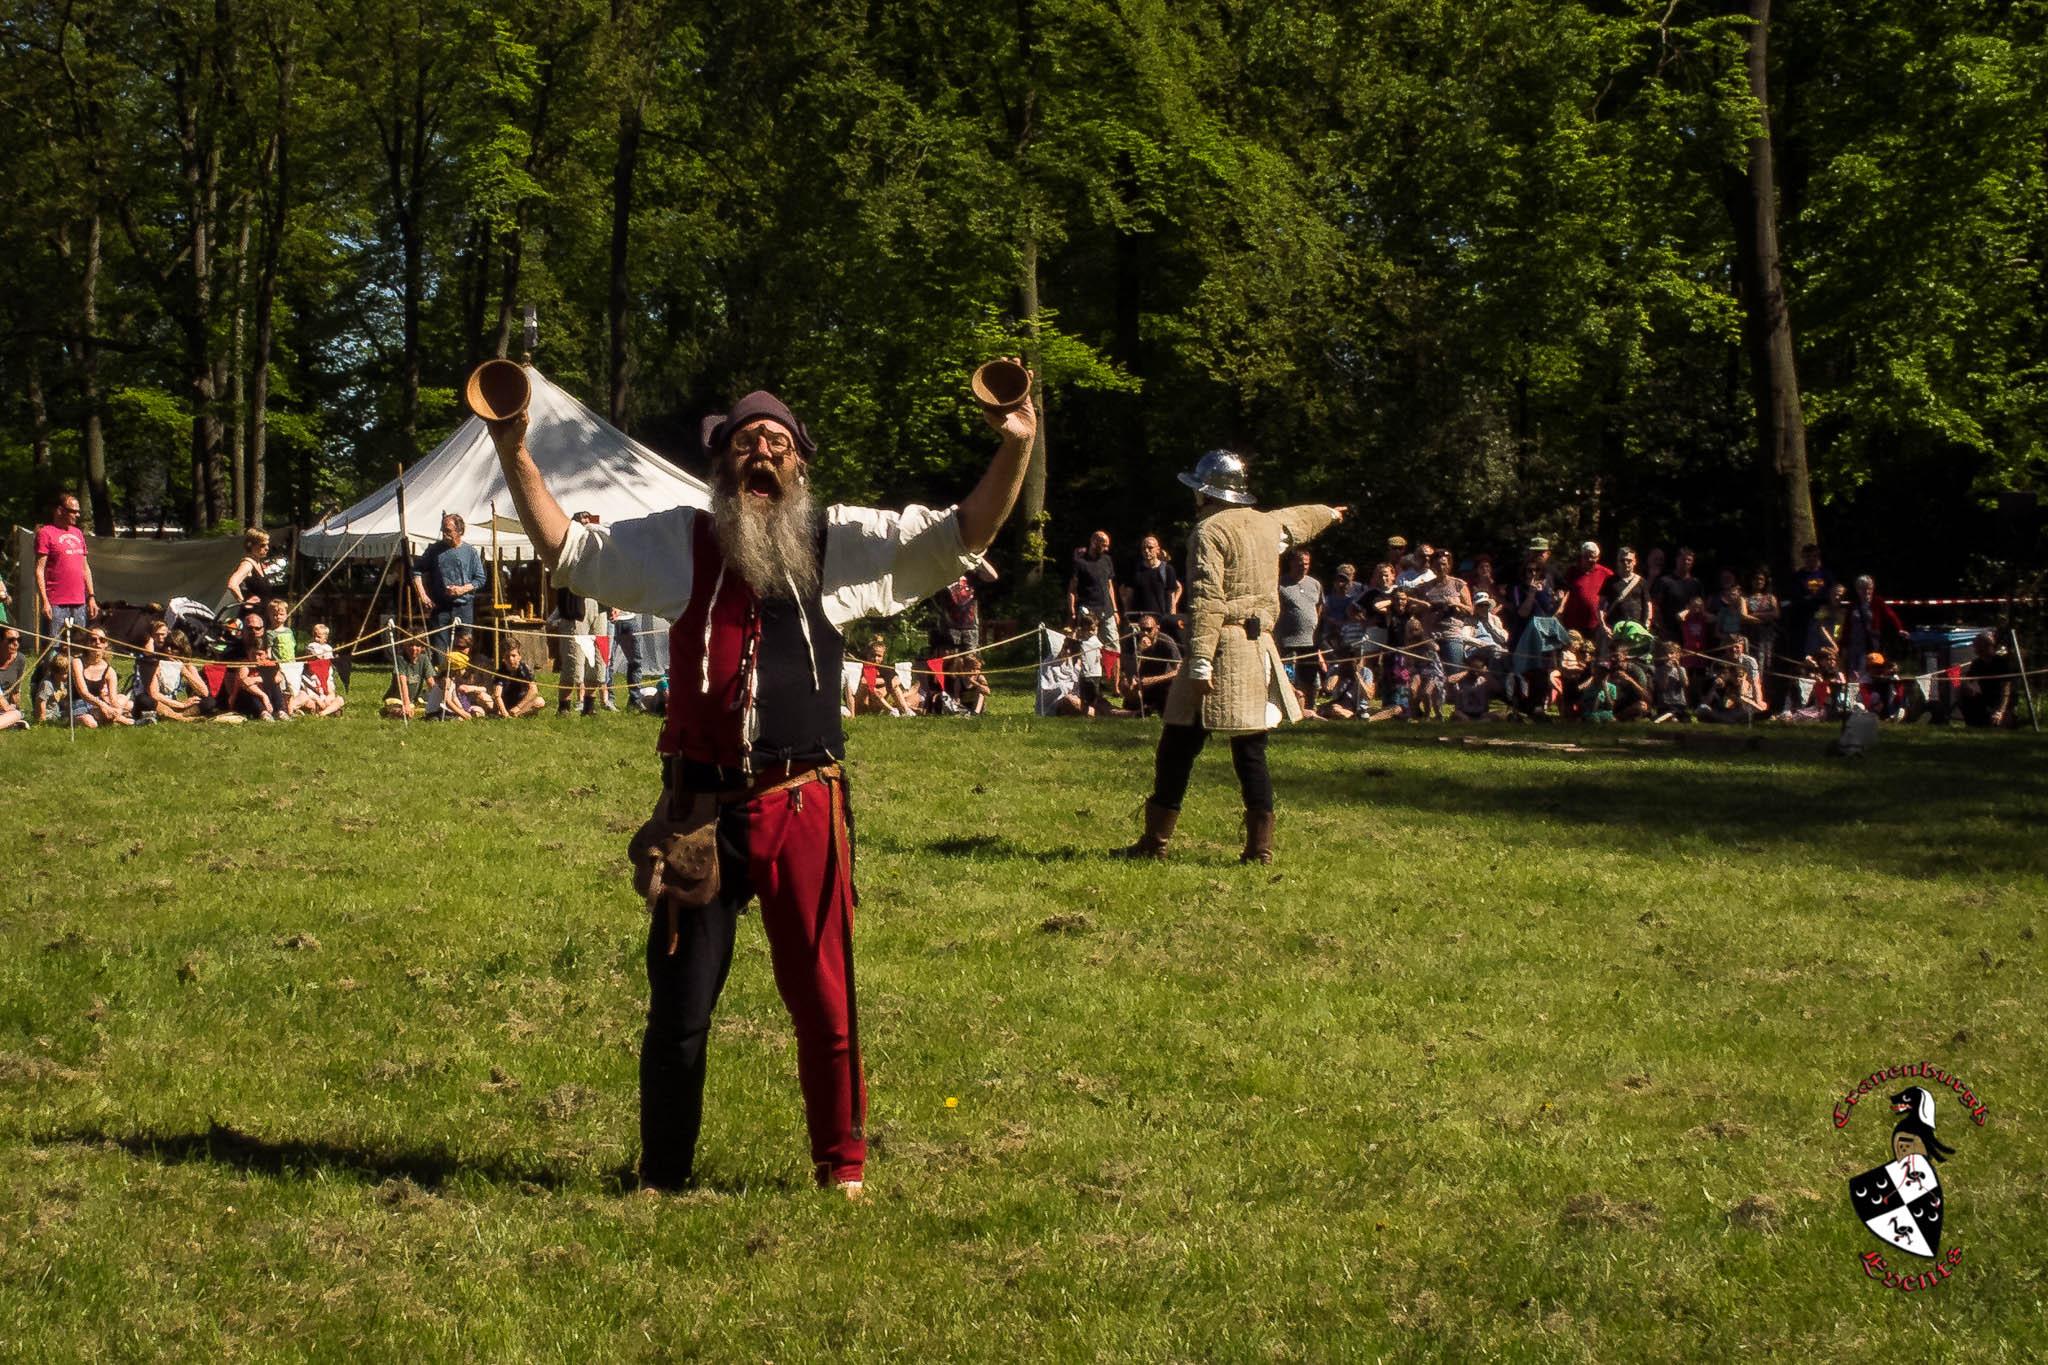 Middeleeuws-Festijn-Cannenburgh-2018-Algemeen-Ellen-la-Faille-39